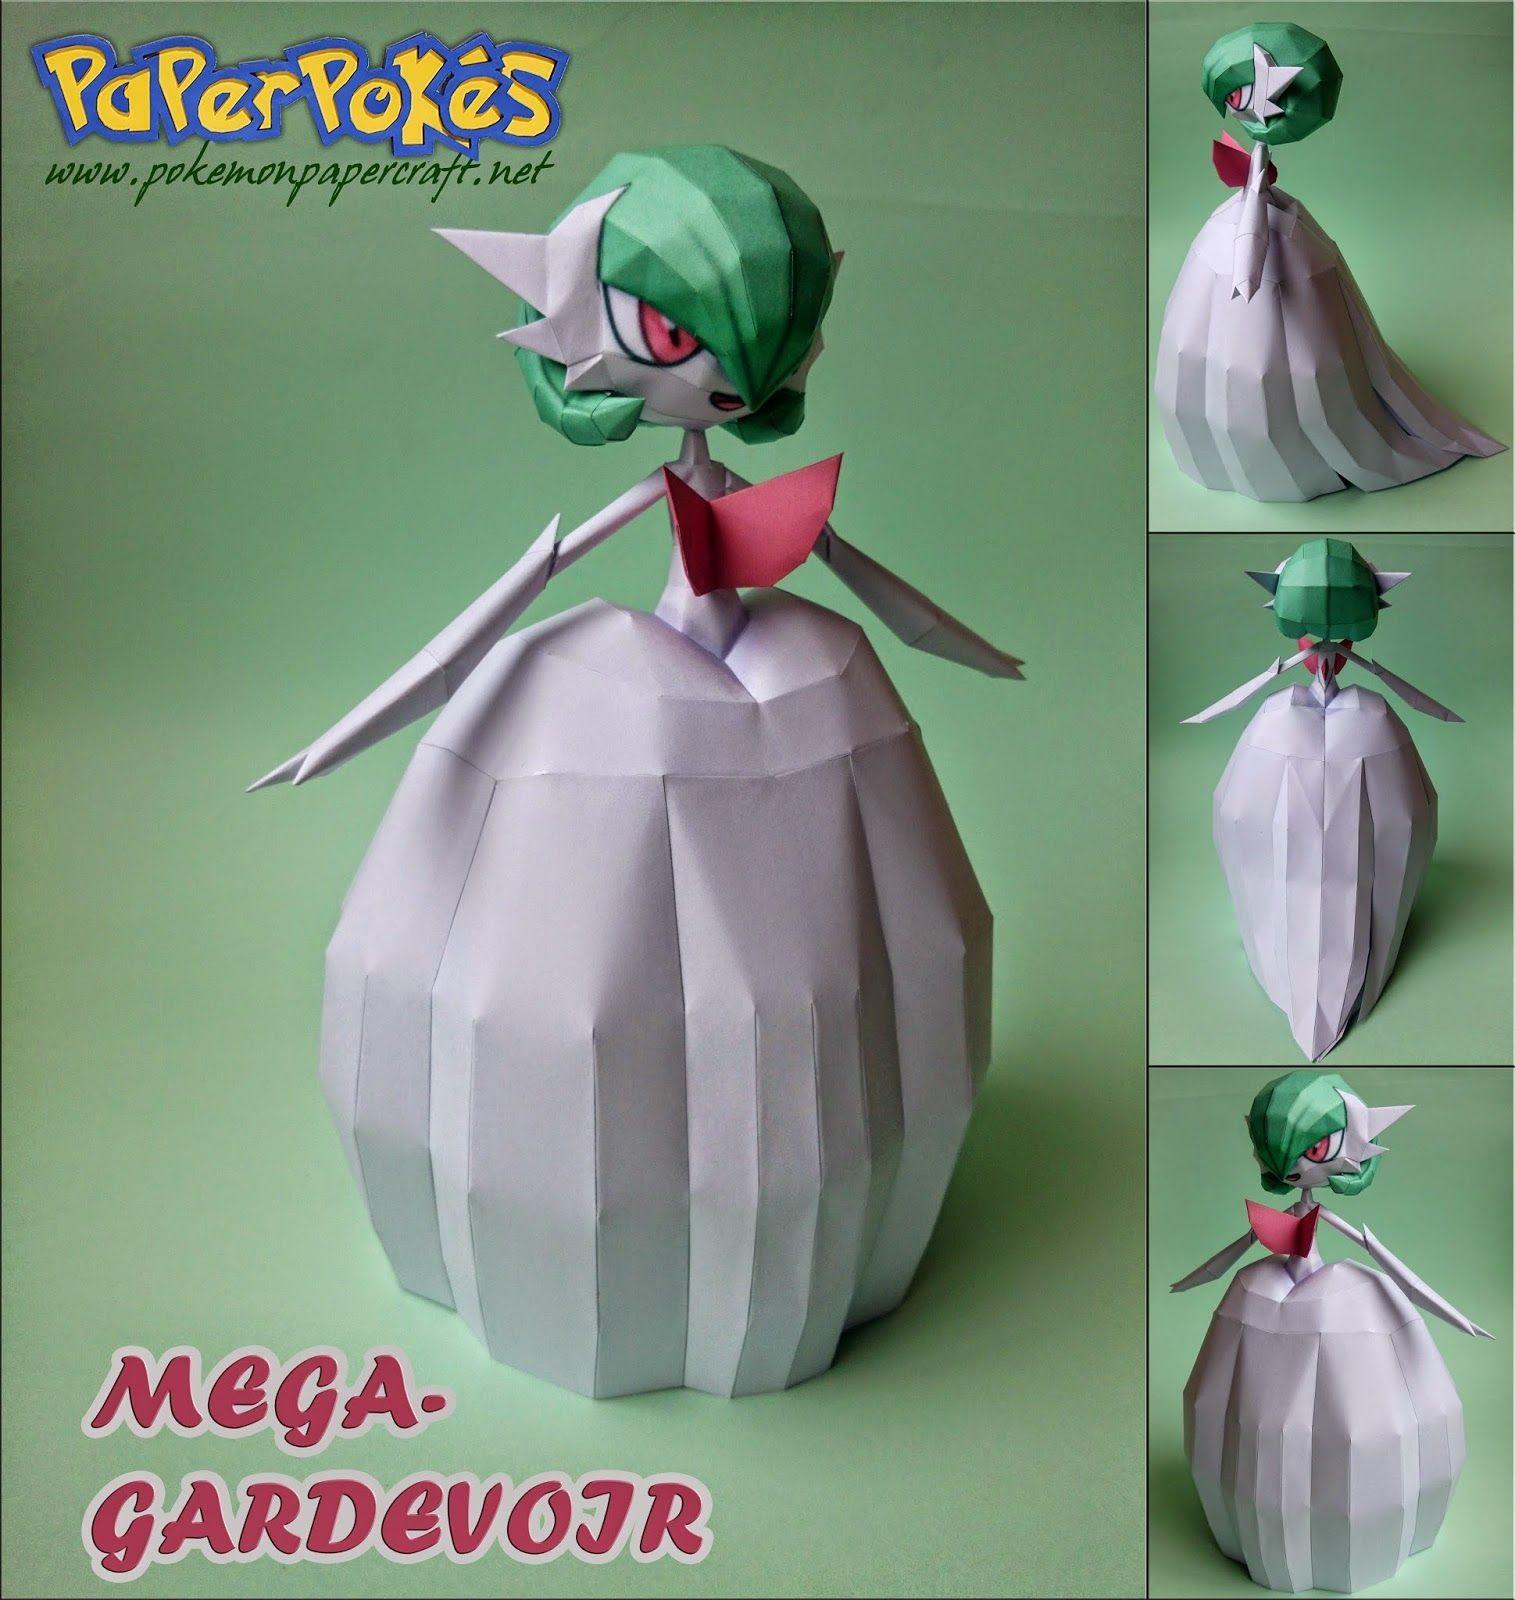 Vaporeon Papercraft Paperpokés Pokémon Papercrafts Mega Gardevoir